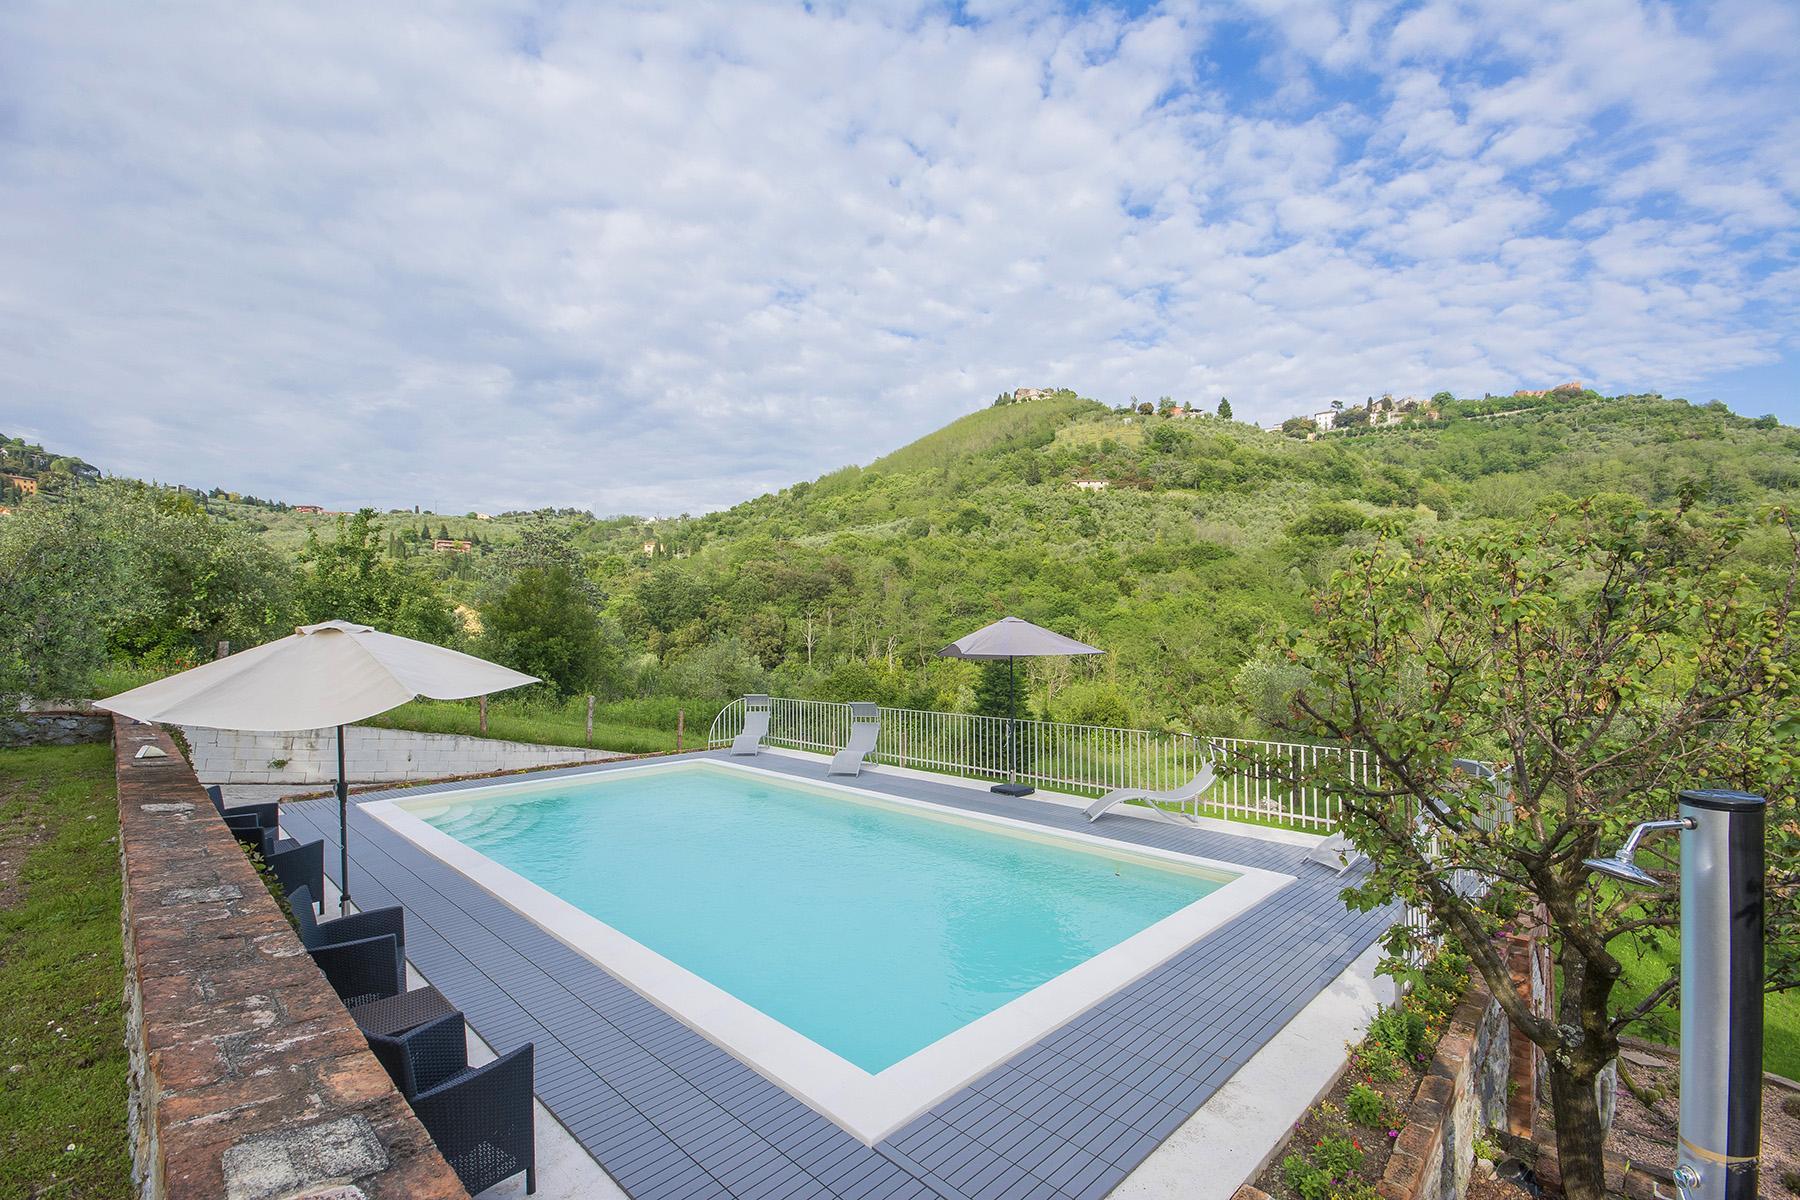 Montecatini Terme小镇优雅的新艺术风格的别墅 - 13